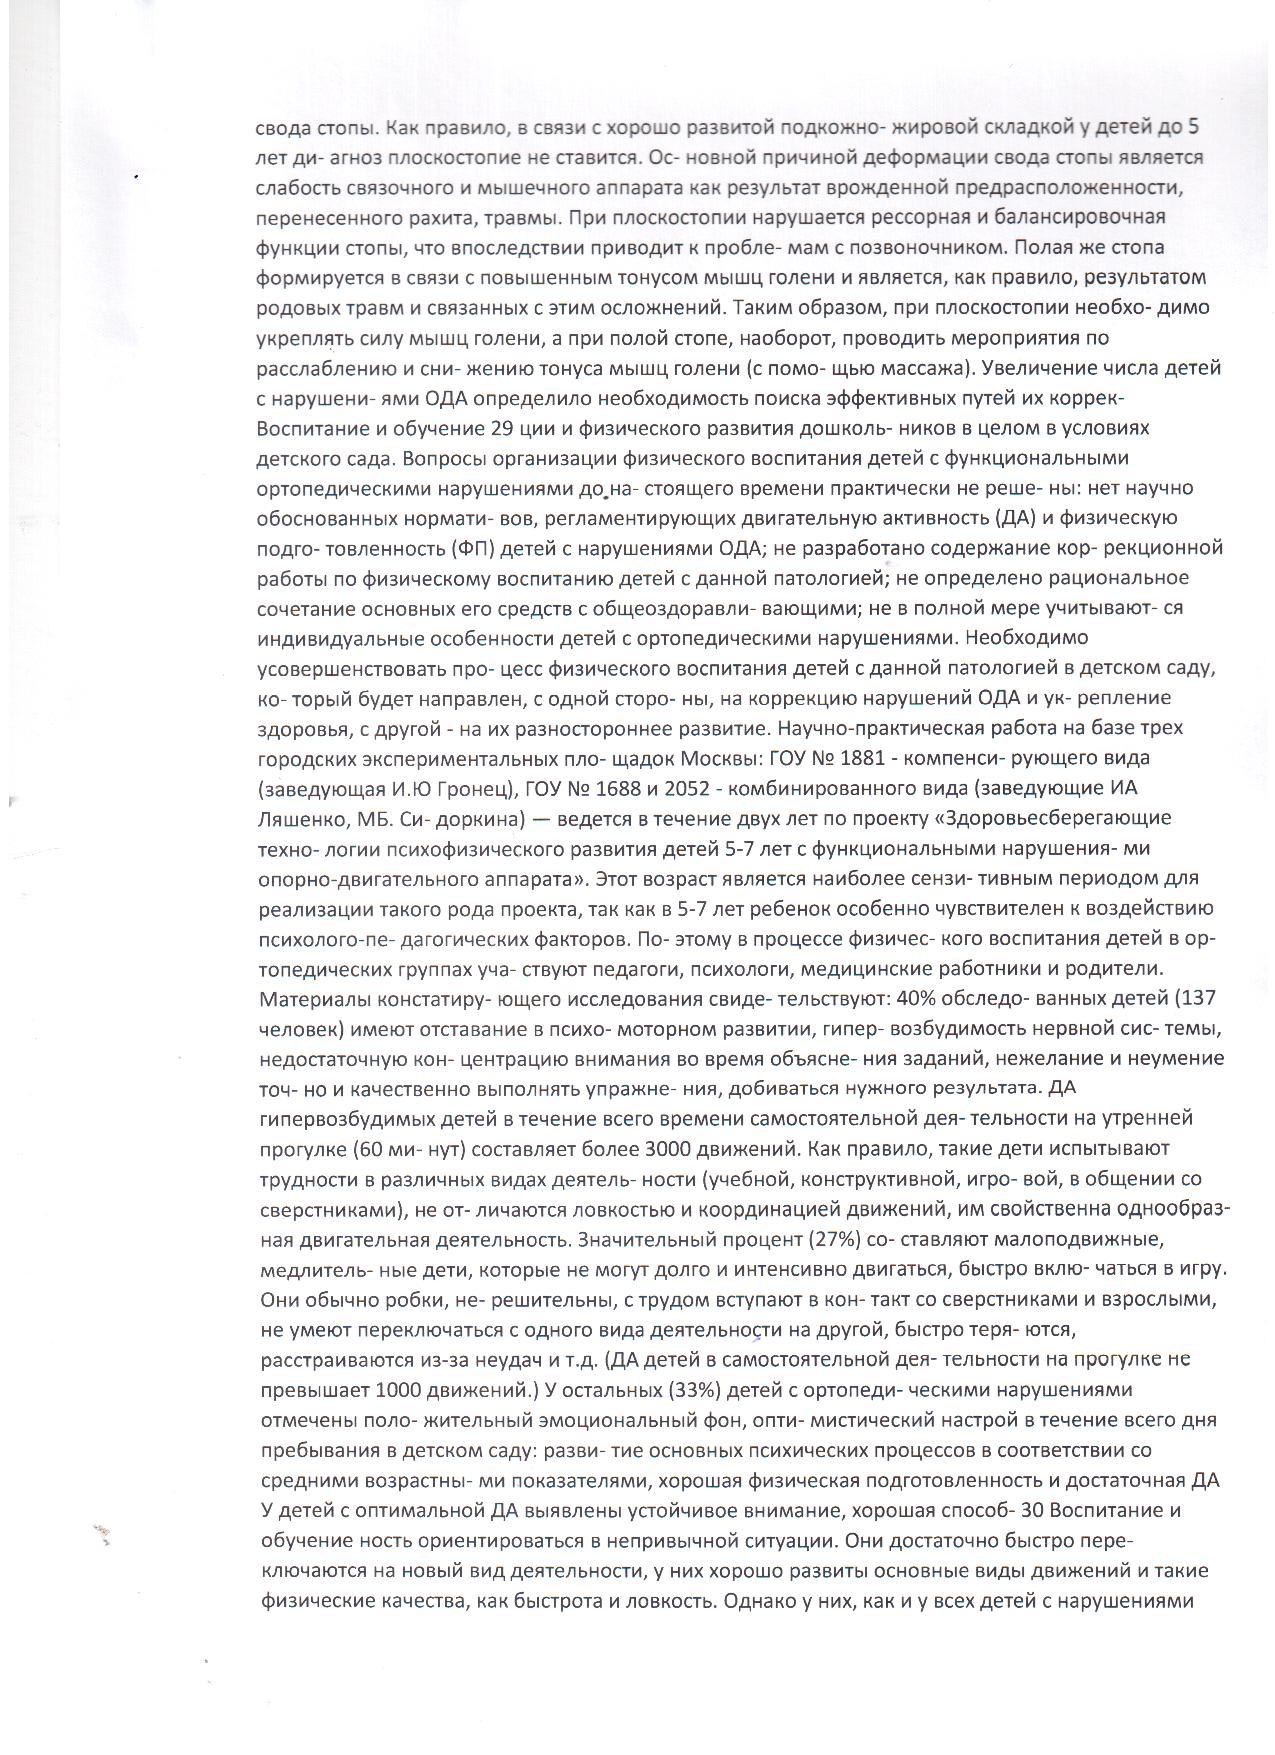 F:\для Татьяны Юрьевны доклады амировой\2\2 001.jpg